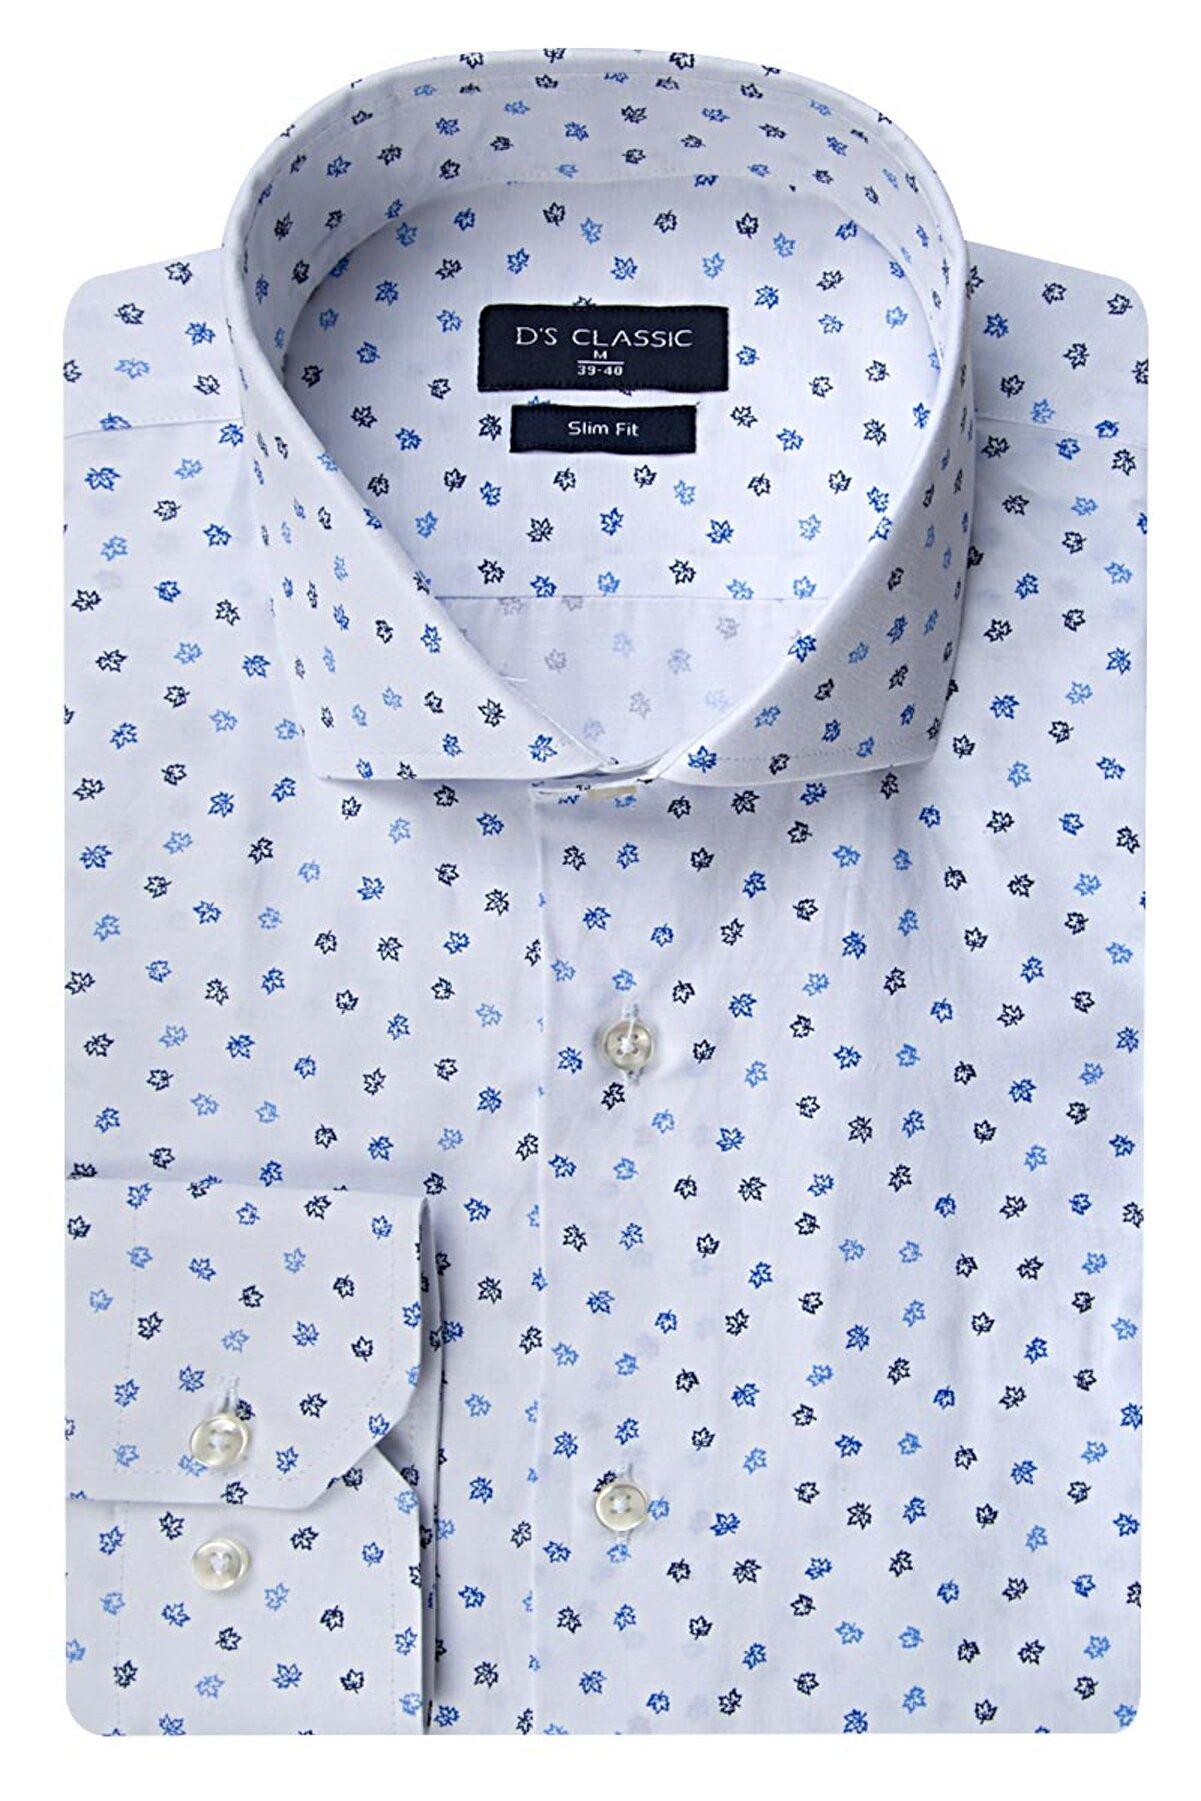 D'S Damat Beyaz Renk Erkek  Gömlek (Slim Fit)